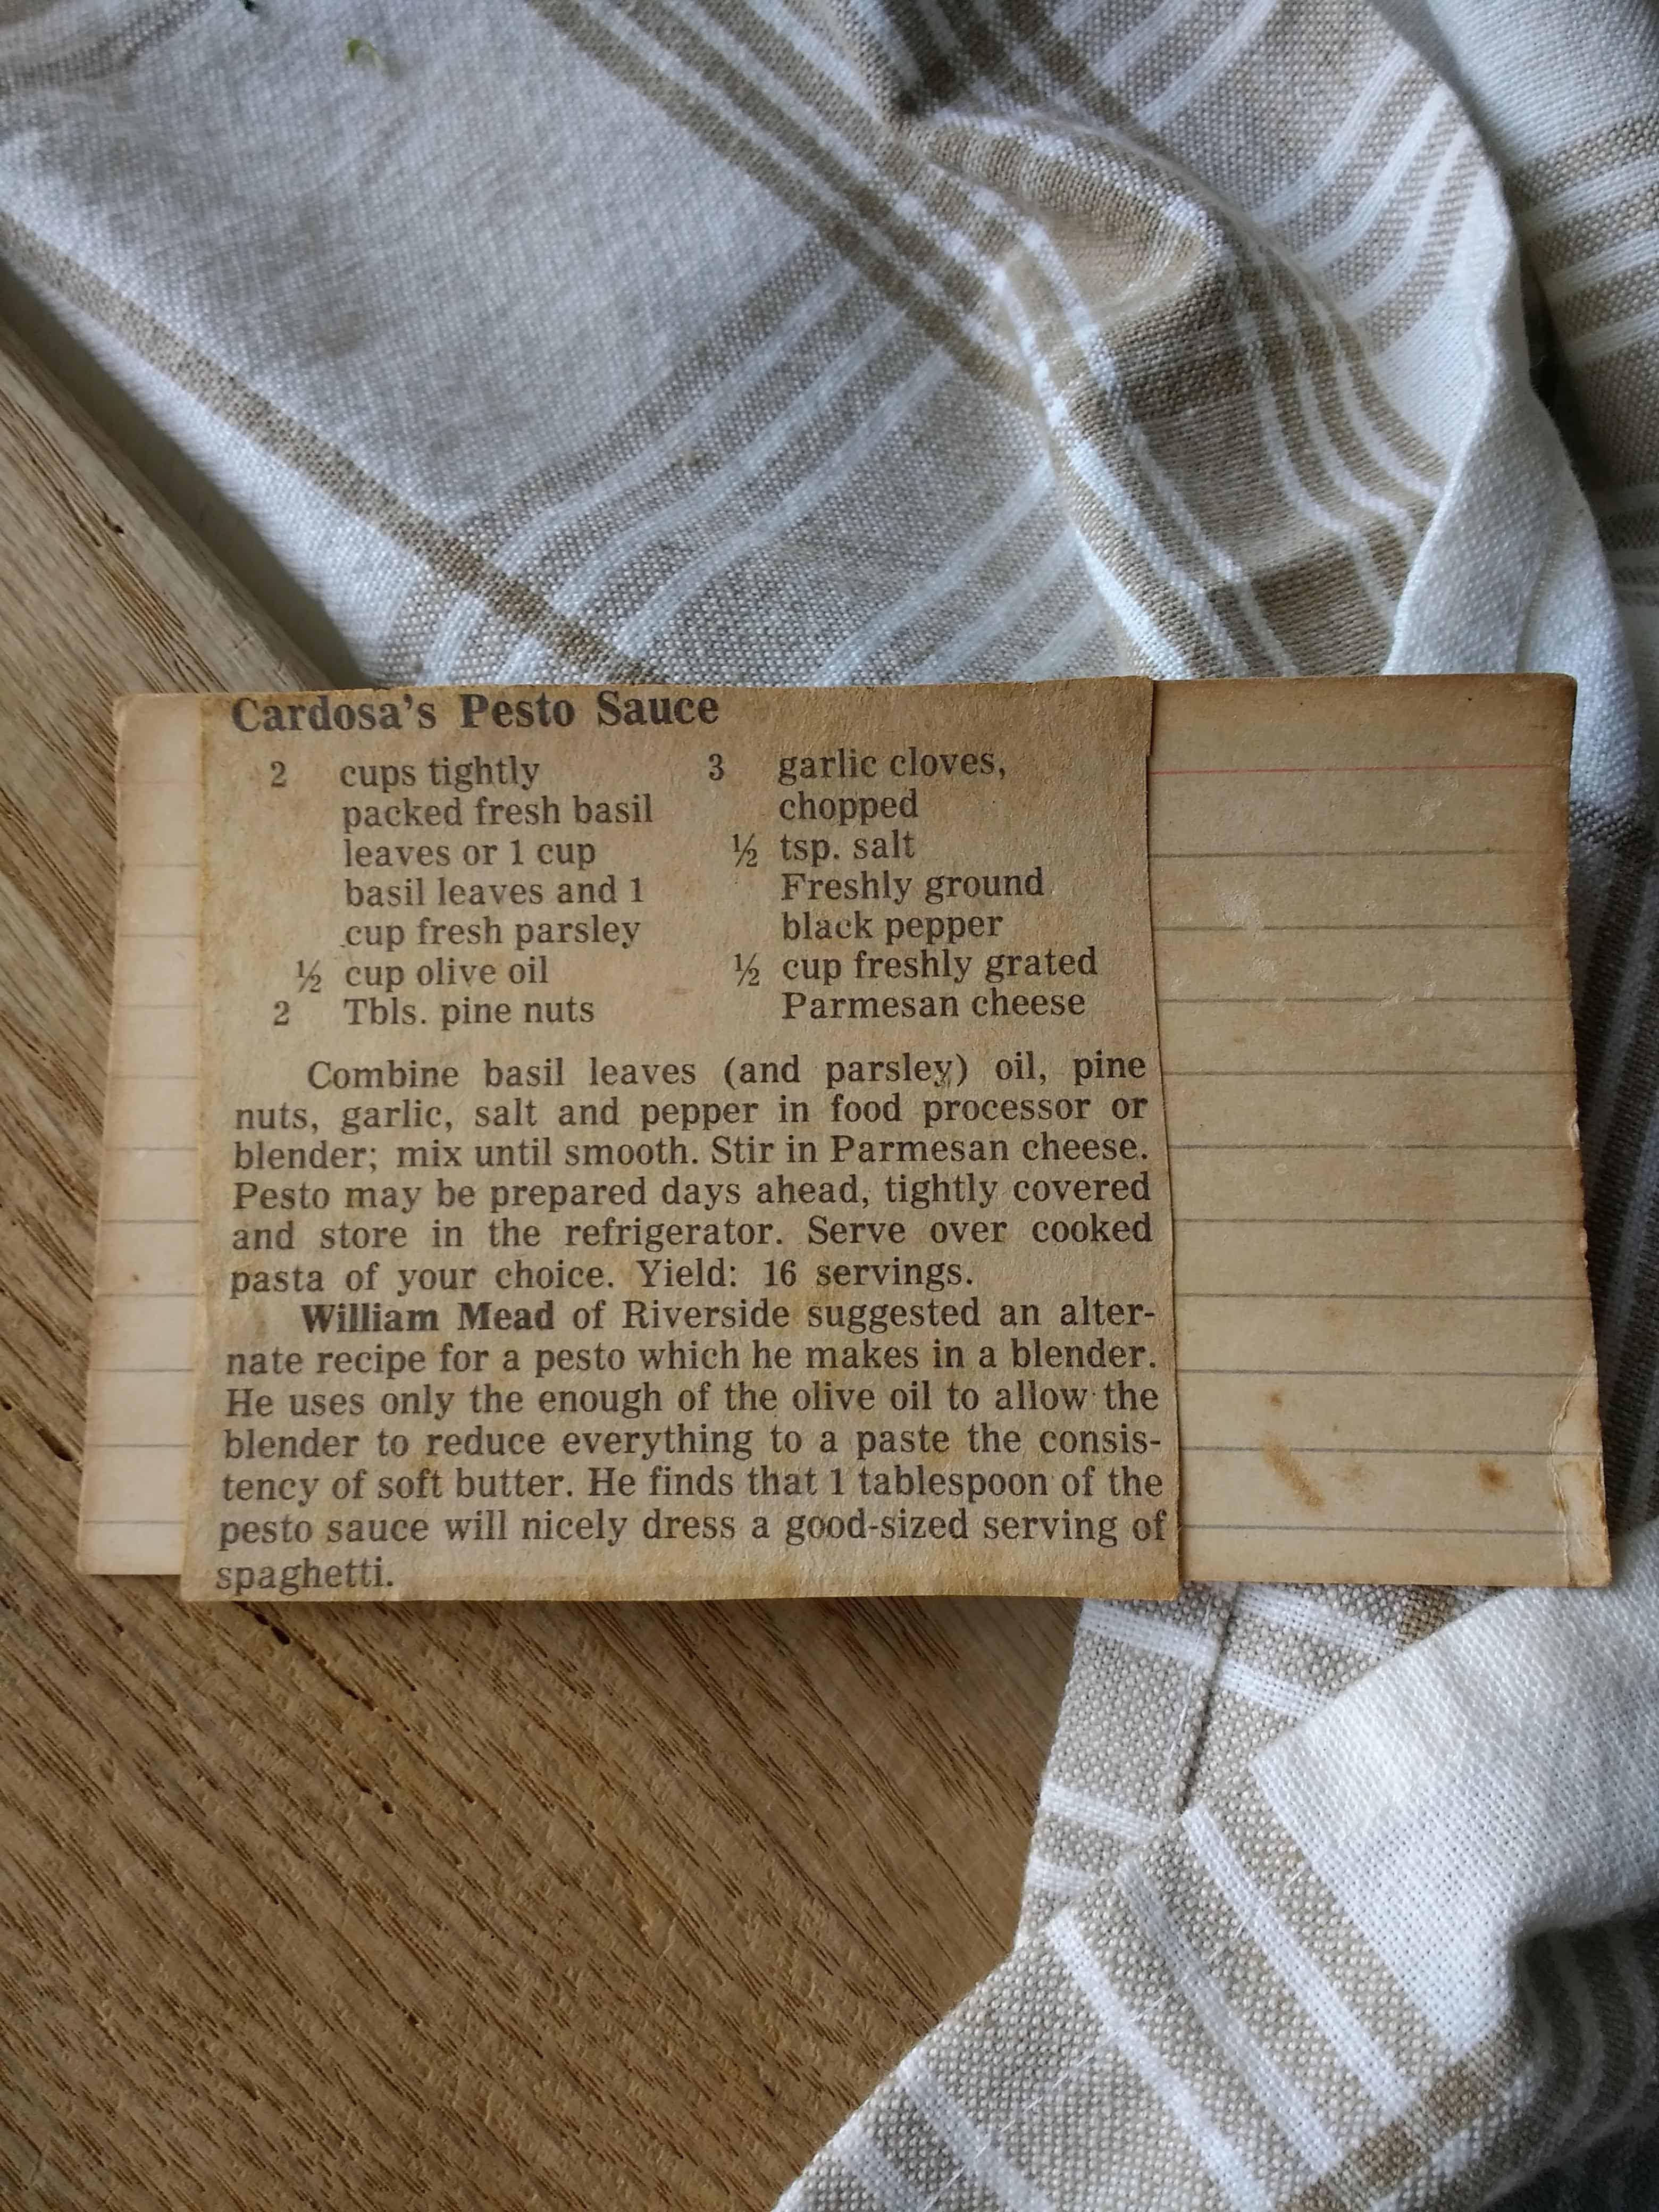 old recipe card for cardosa's pesto